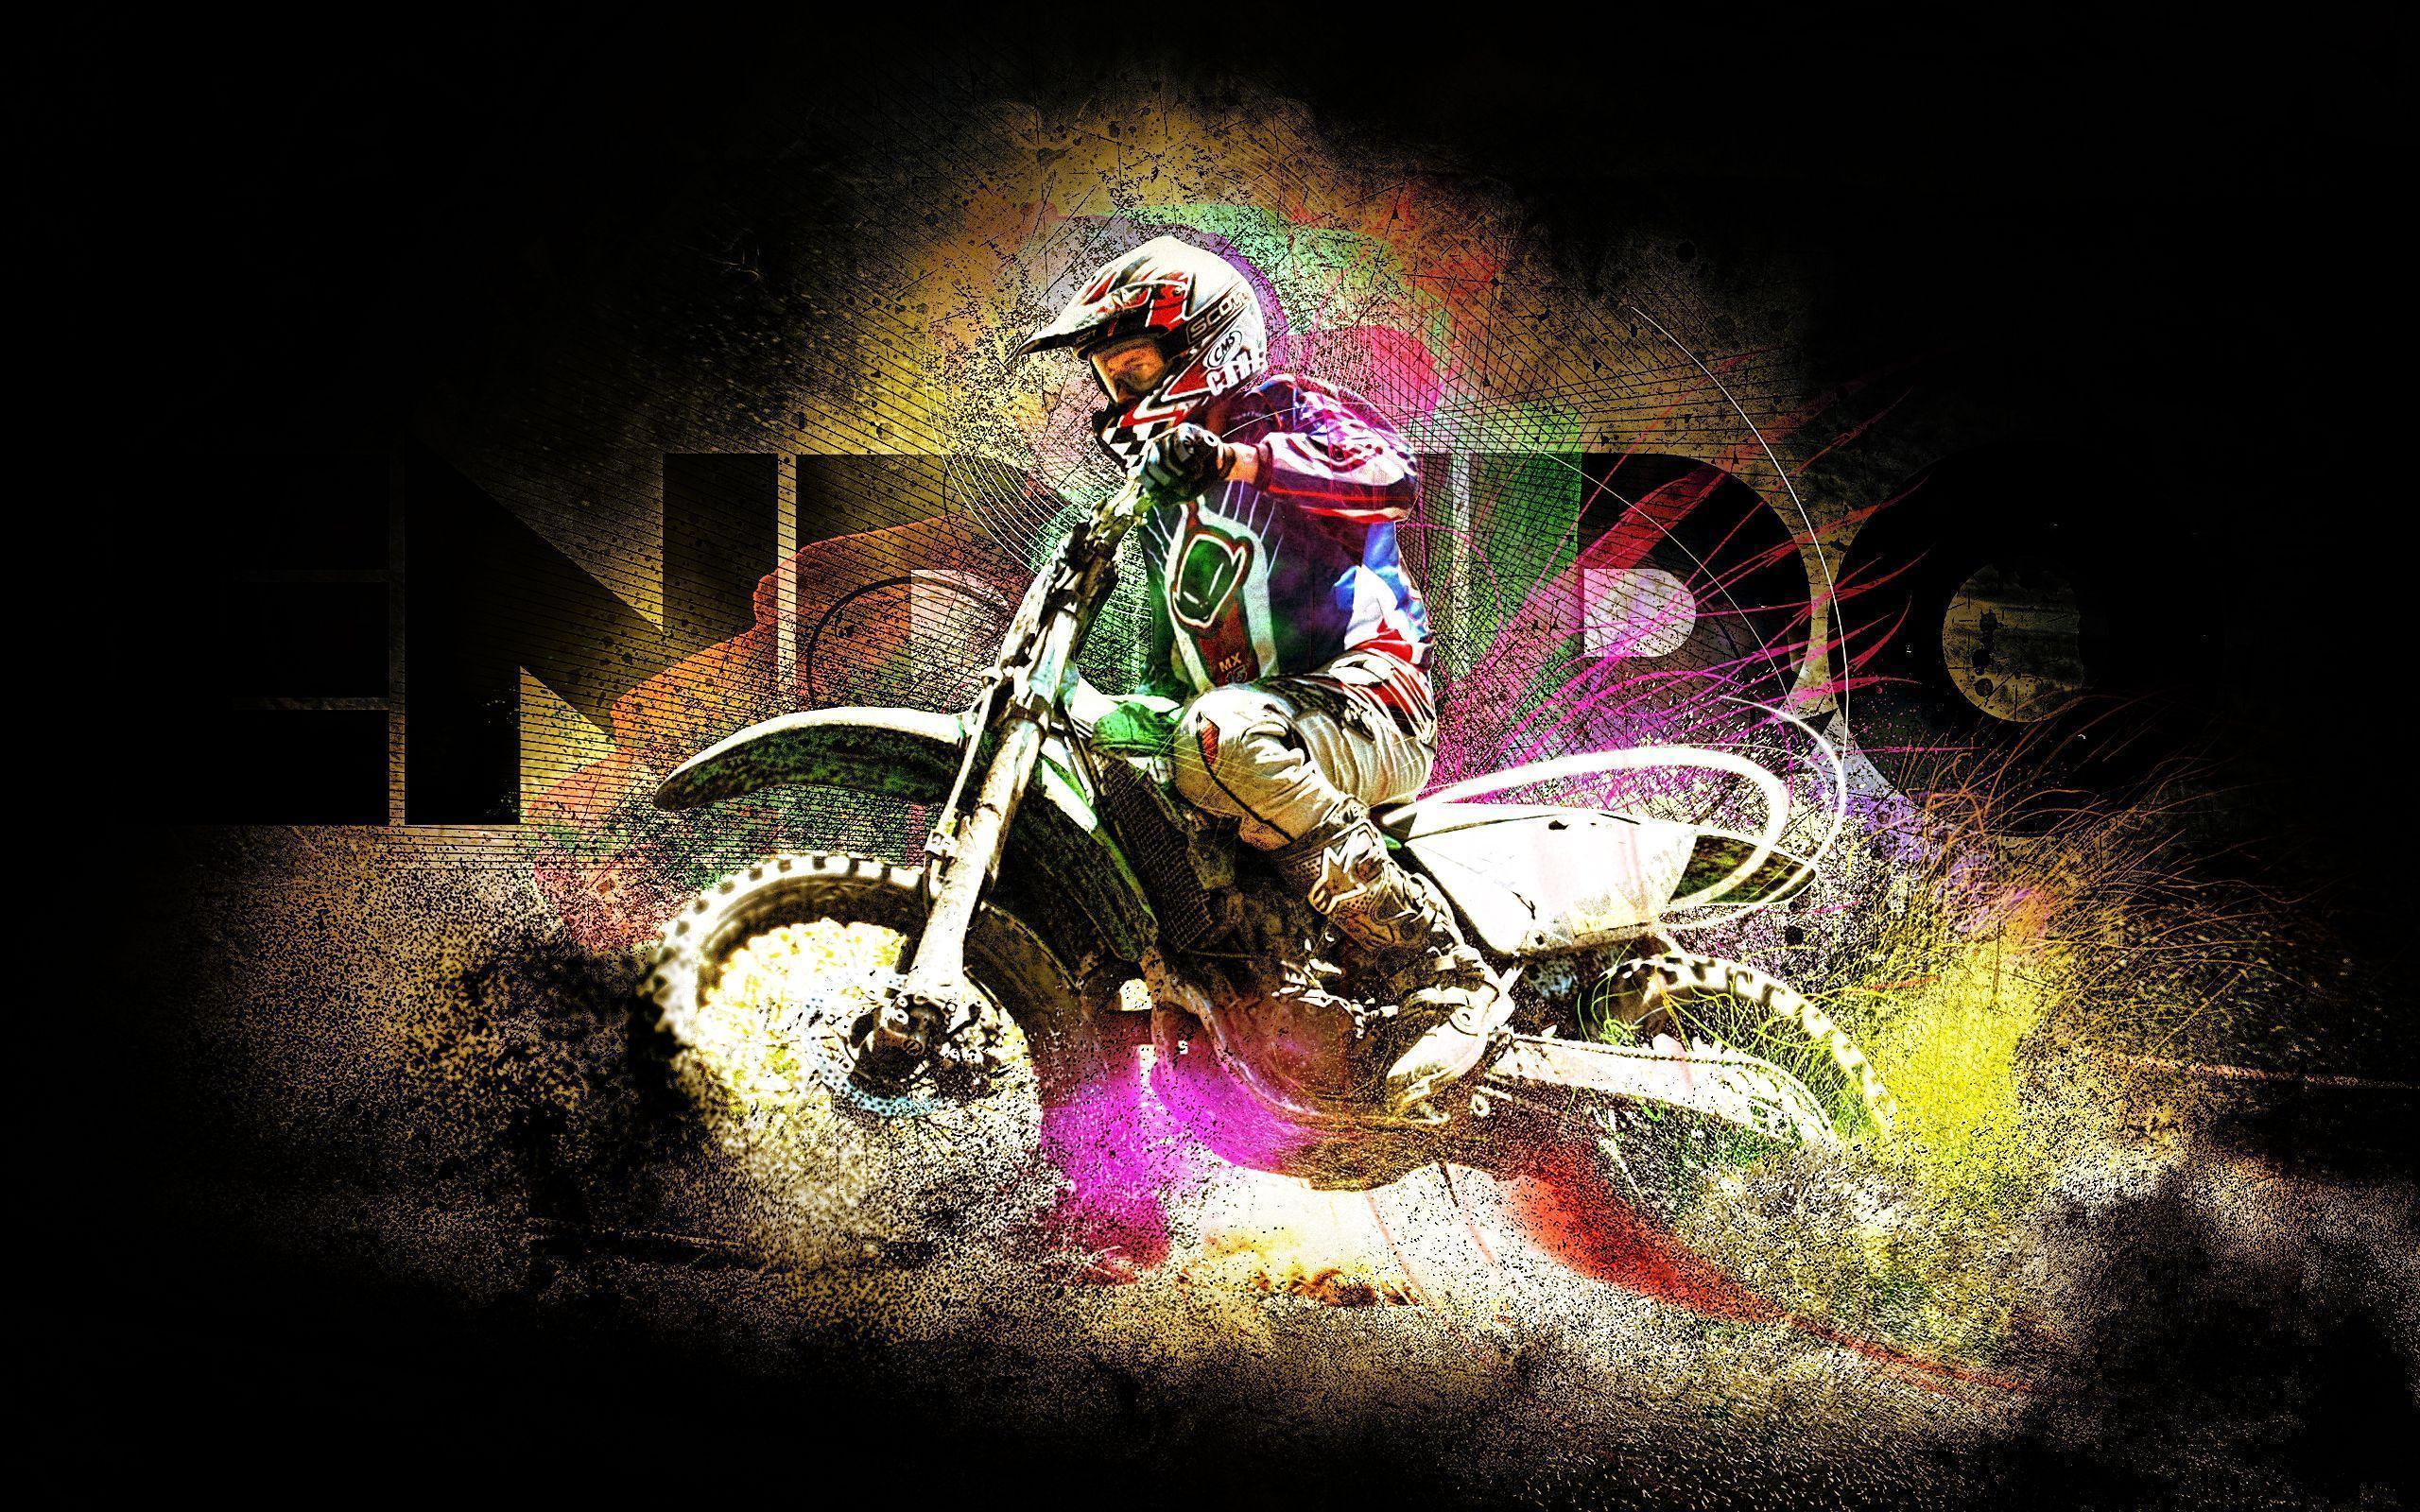 Ktm Motocross Wallpaper Hd Enduro Wallpapers Wallpaper Cave